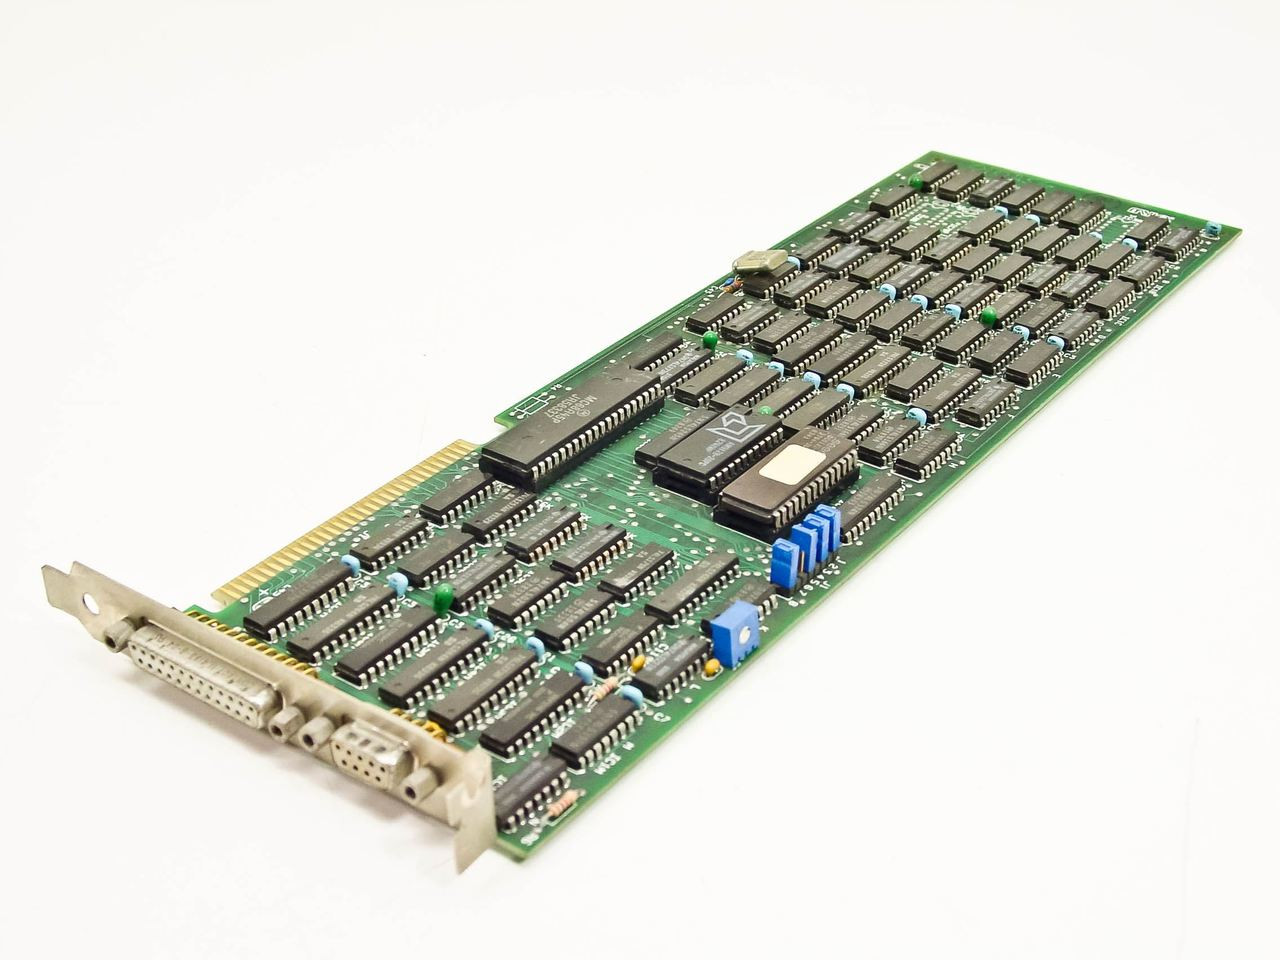 Mylex 10256 ISA 8 Bit Parallel Port DB 9F